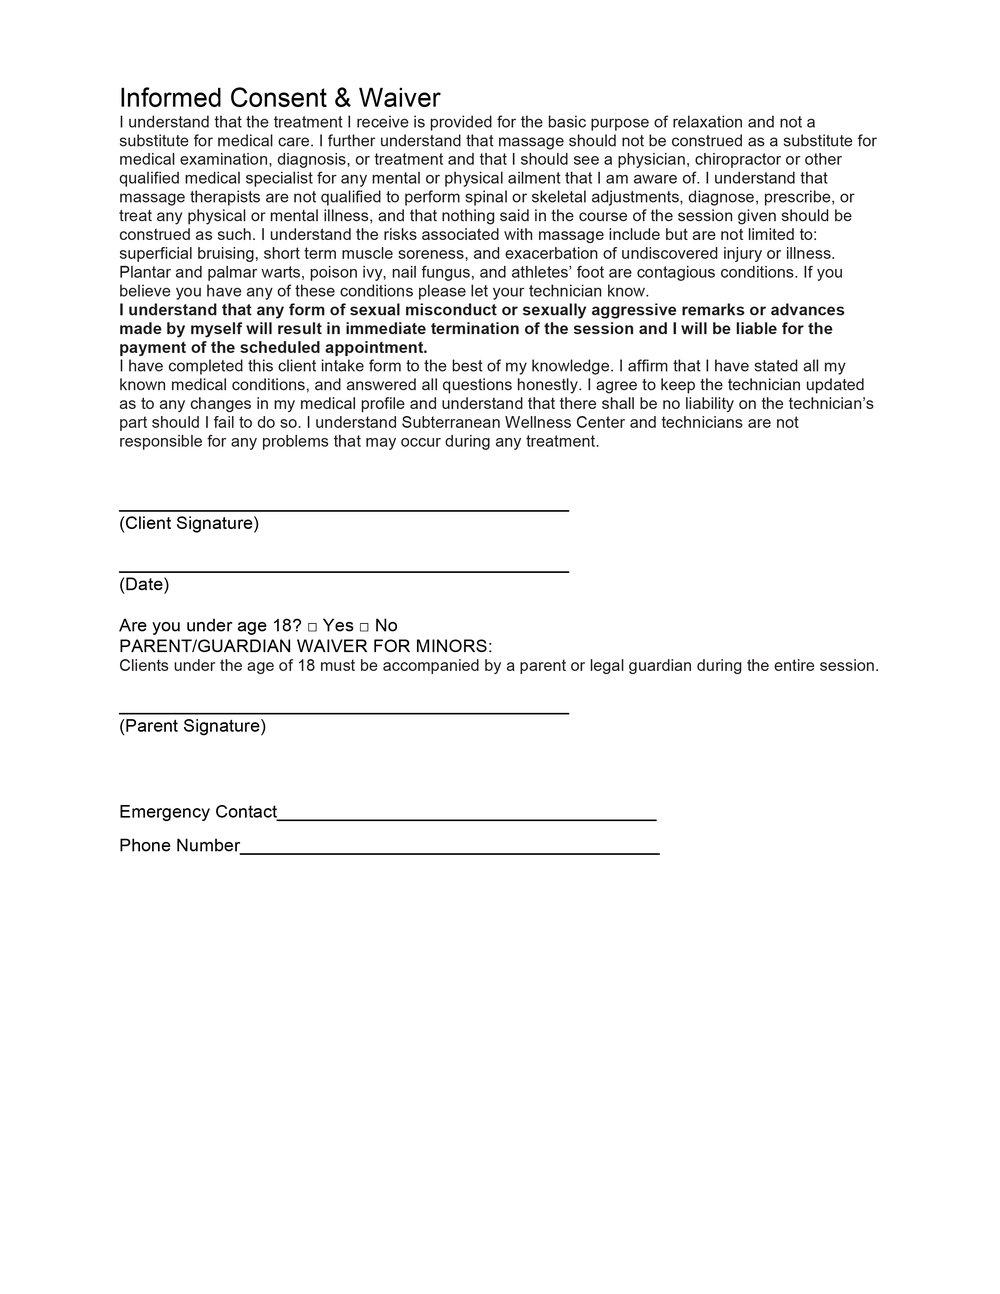 InkCredibleOutcomesSPA-General-Health-Intake-Form-2.jpg